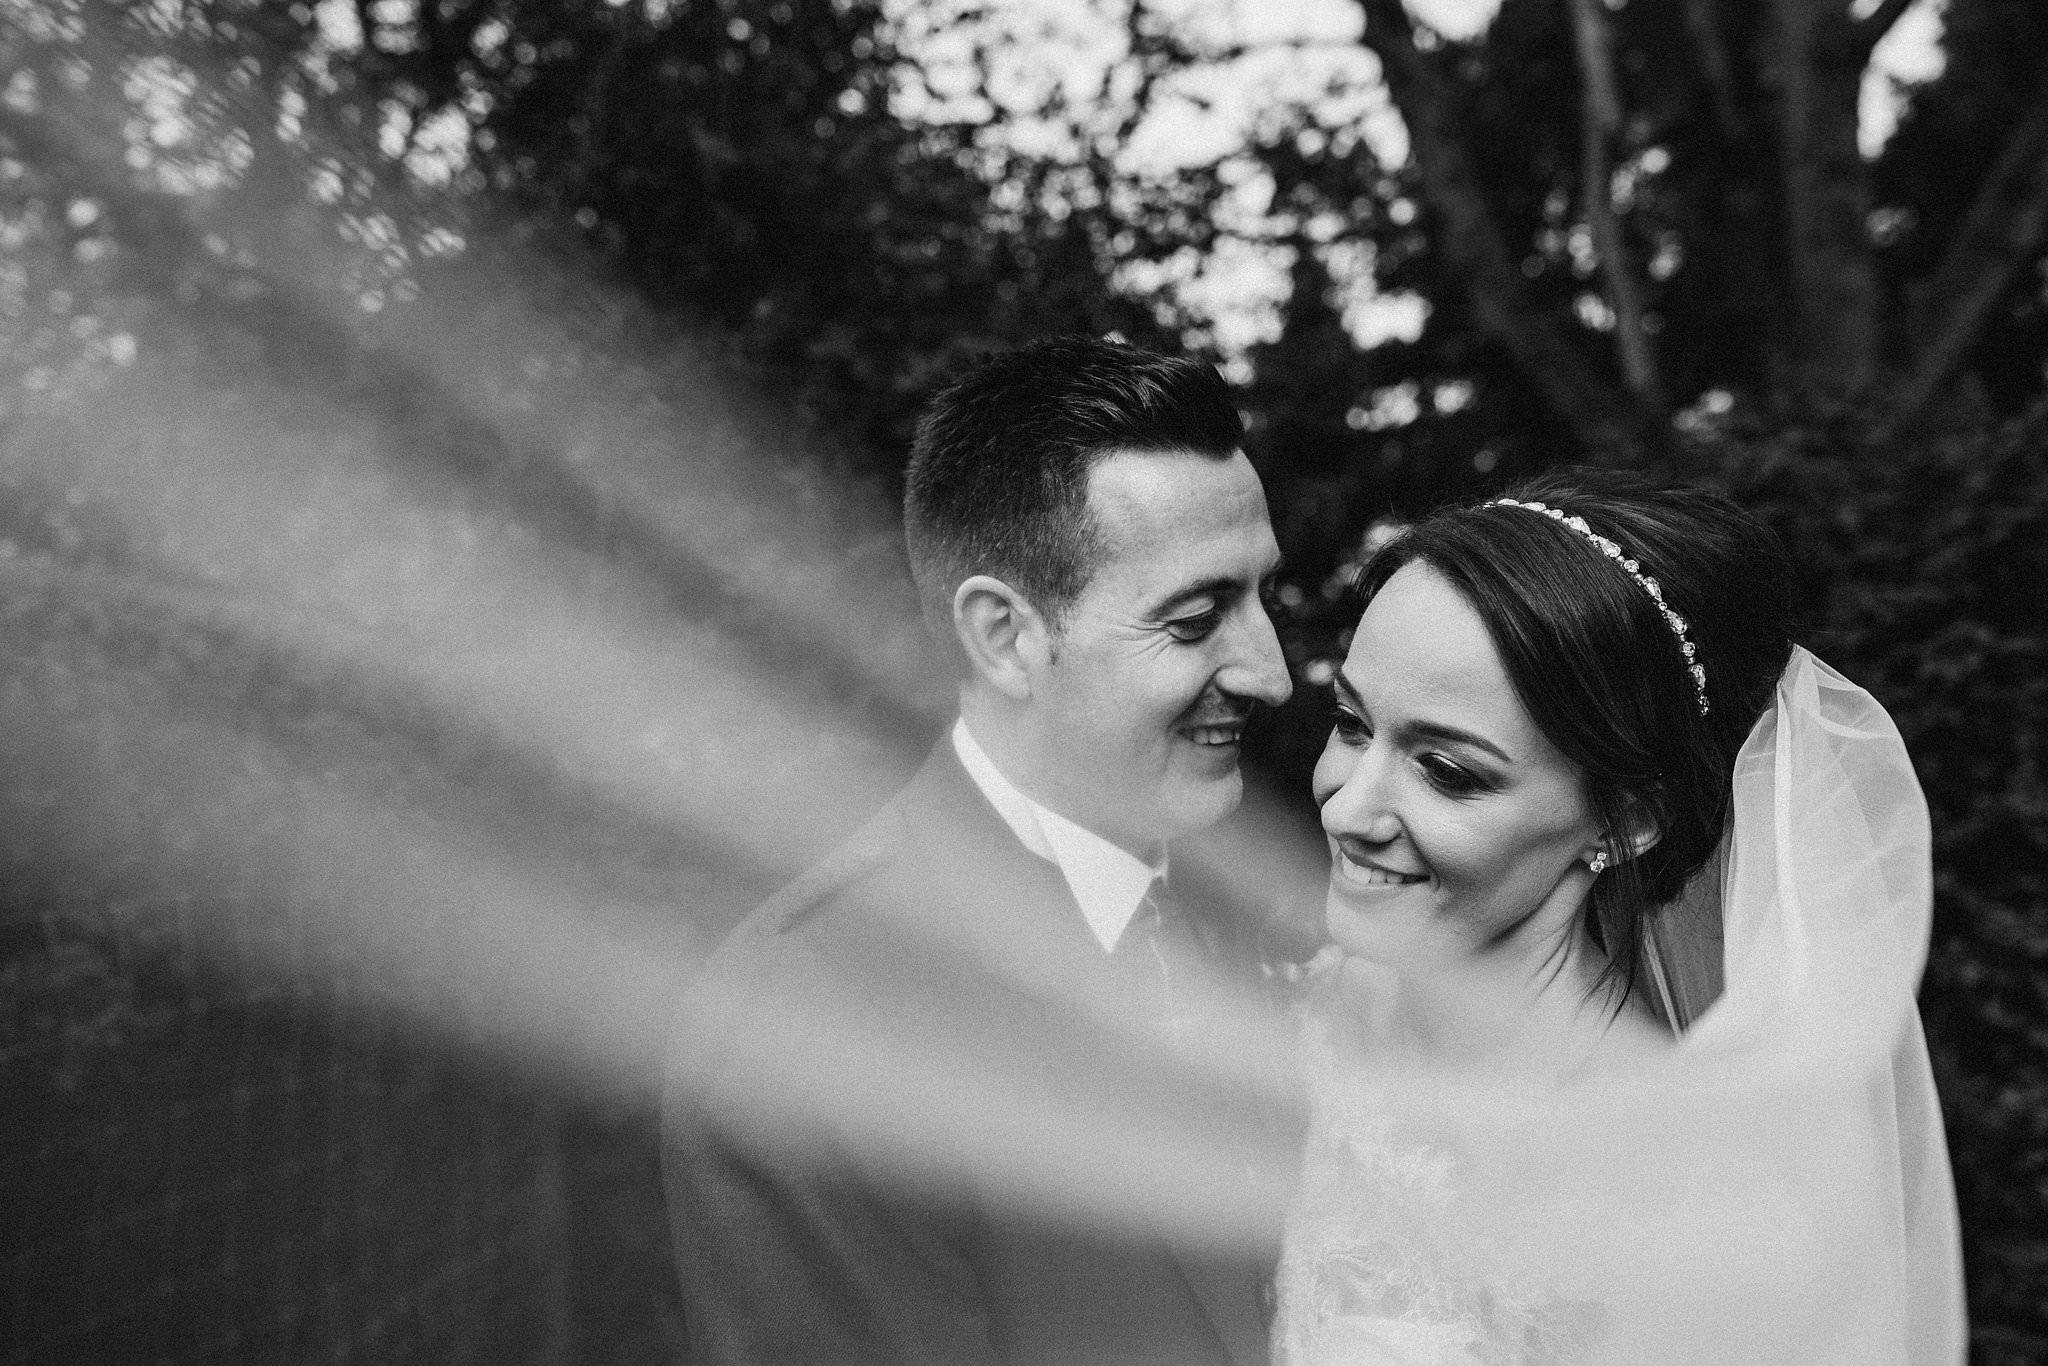 kirknewton stables wedding photographer (53).jpg